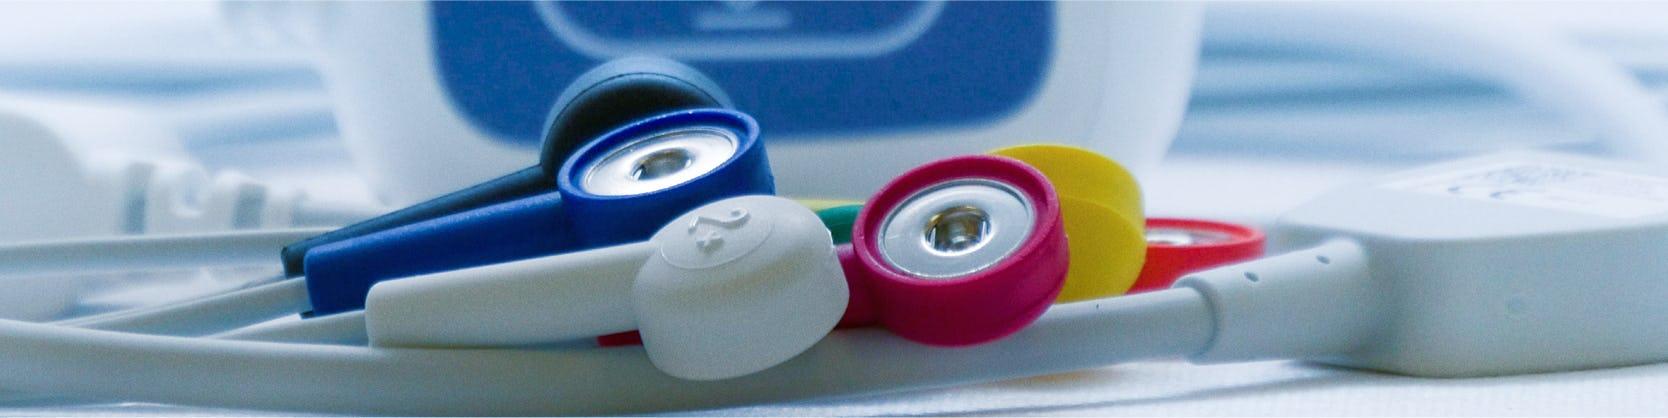 Holter ECG / EKG  | Centrele Ares | Inovatie in Cardiologie